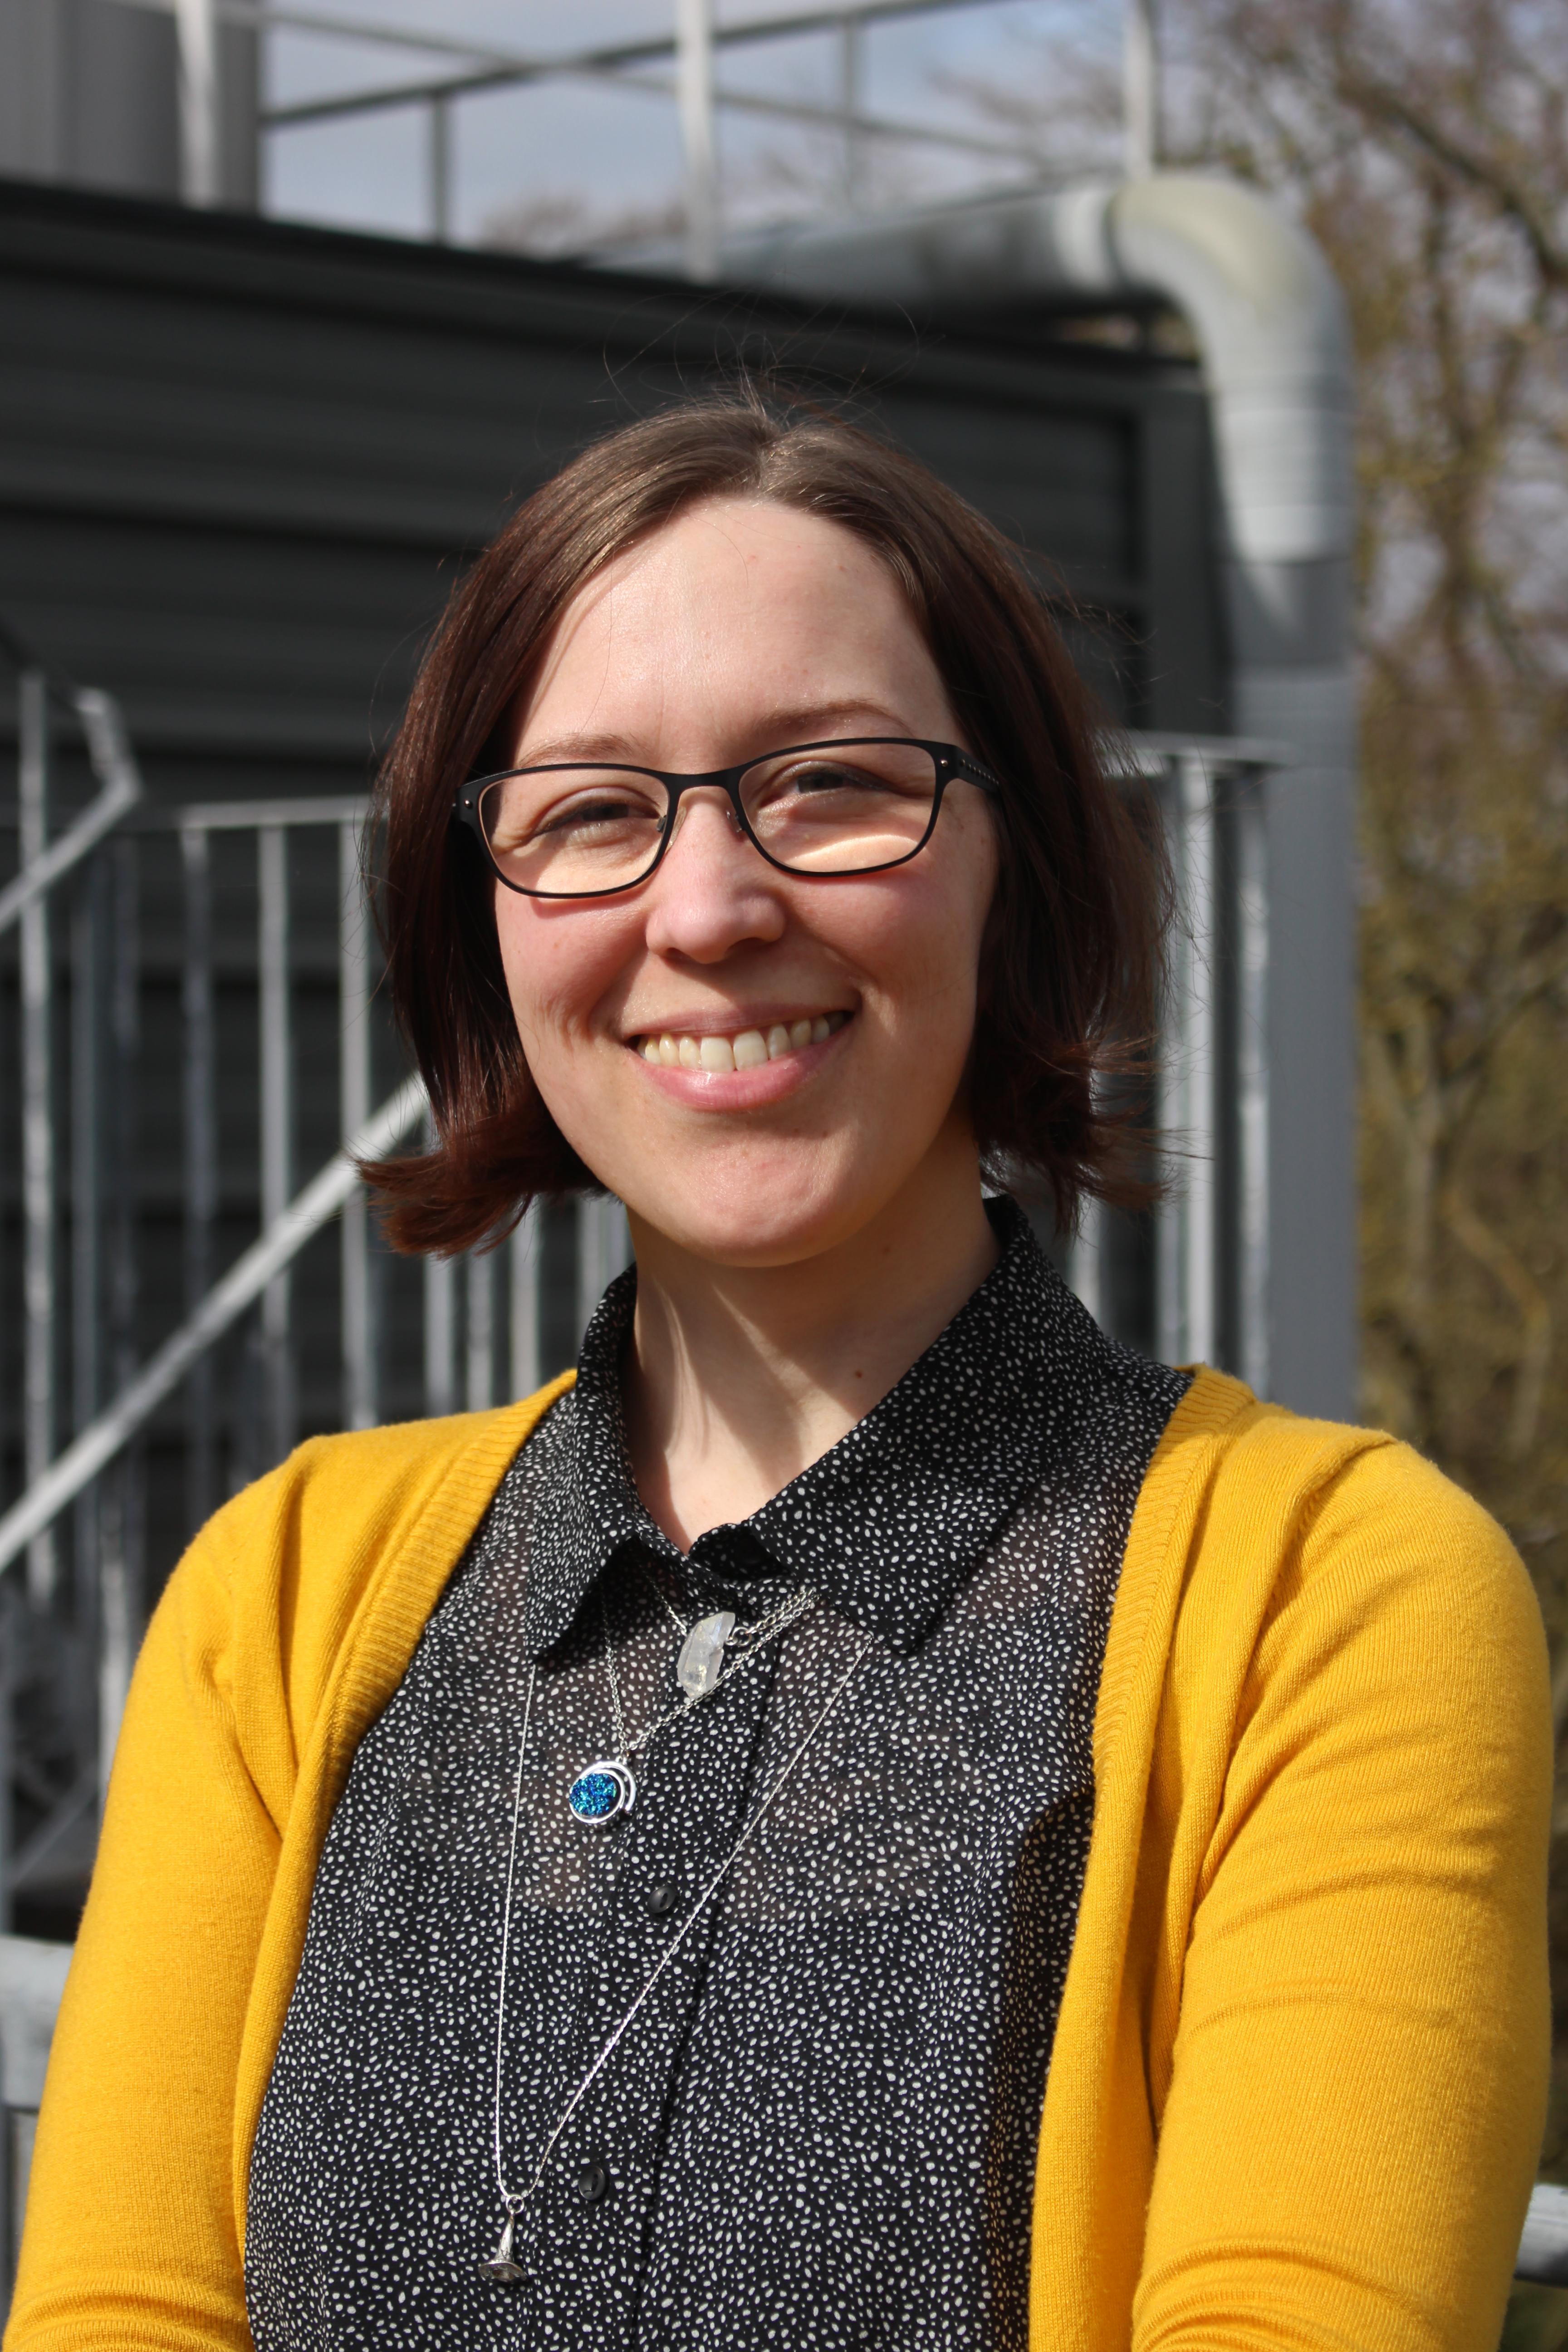 Blog - Introducing Kirsten Lamb - Information Specialist